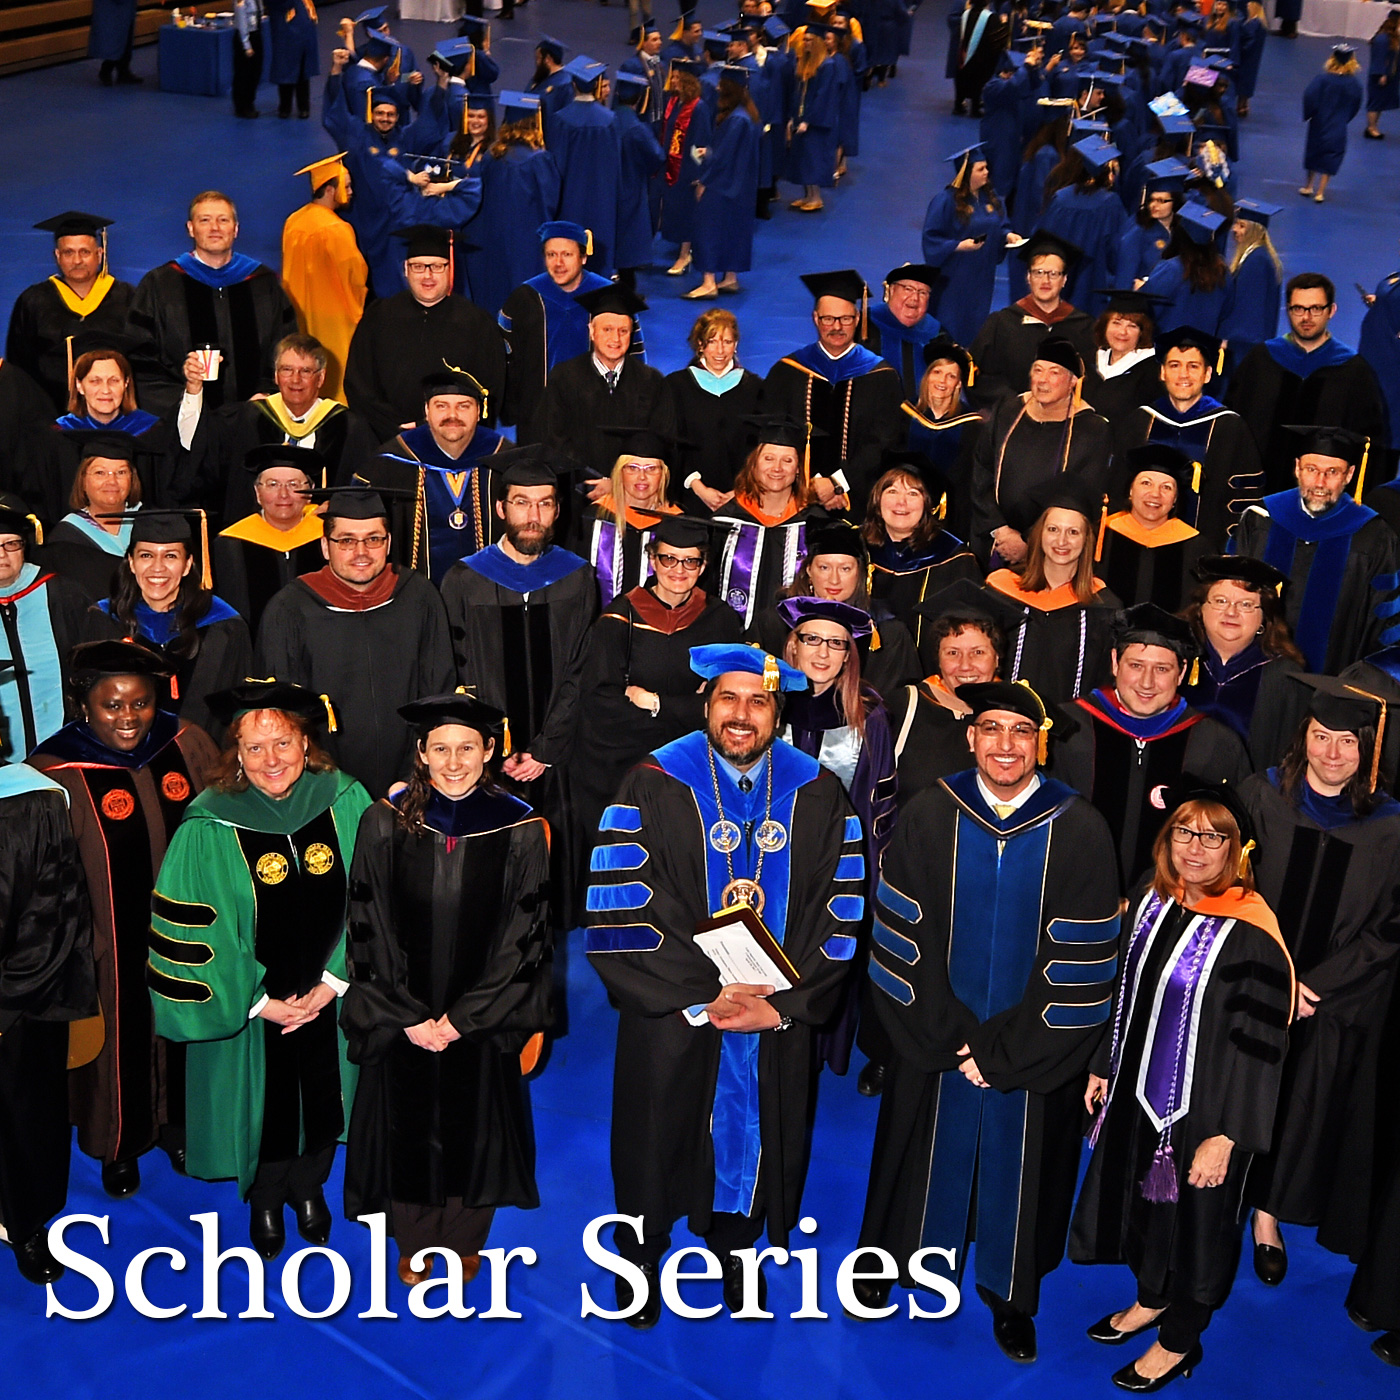 Scholar Series